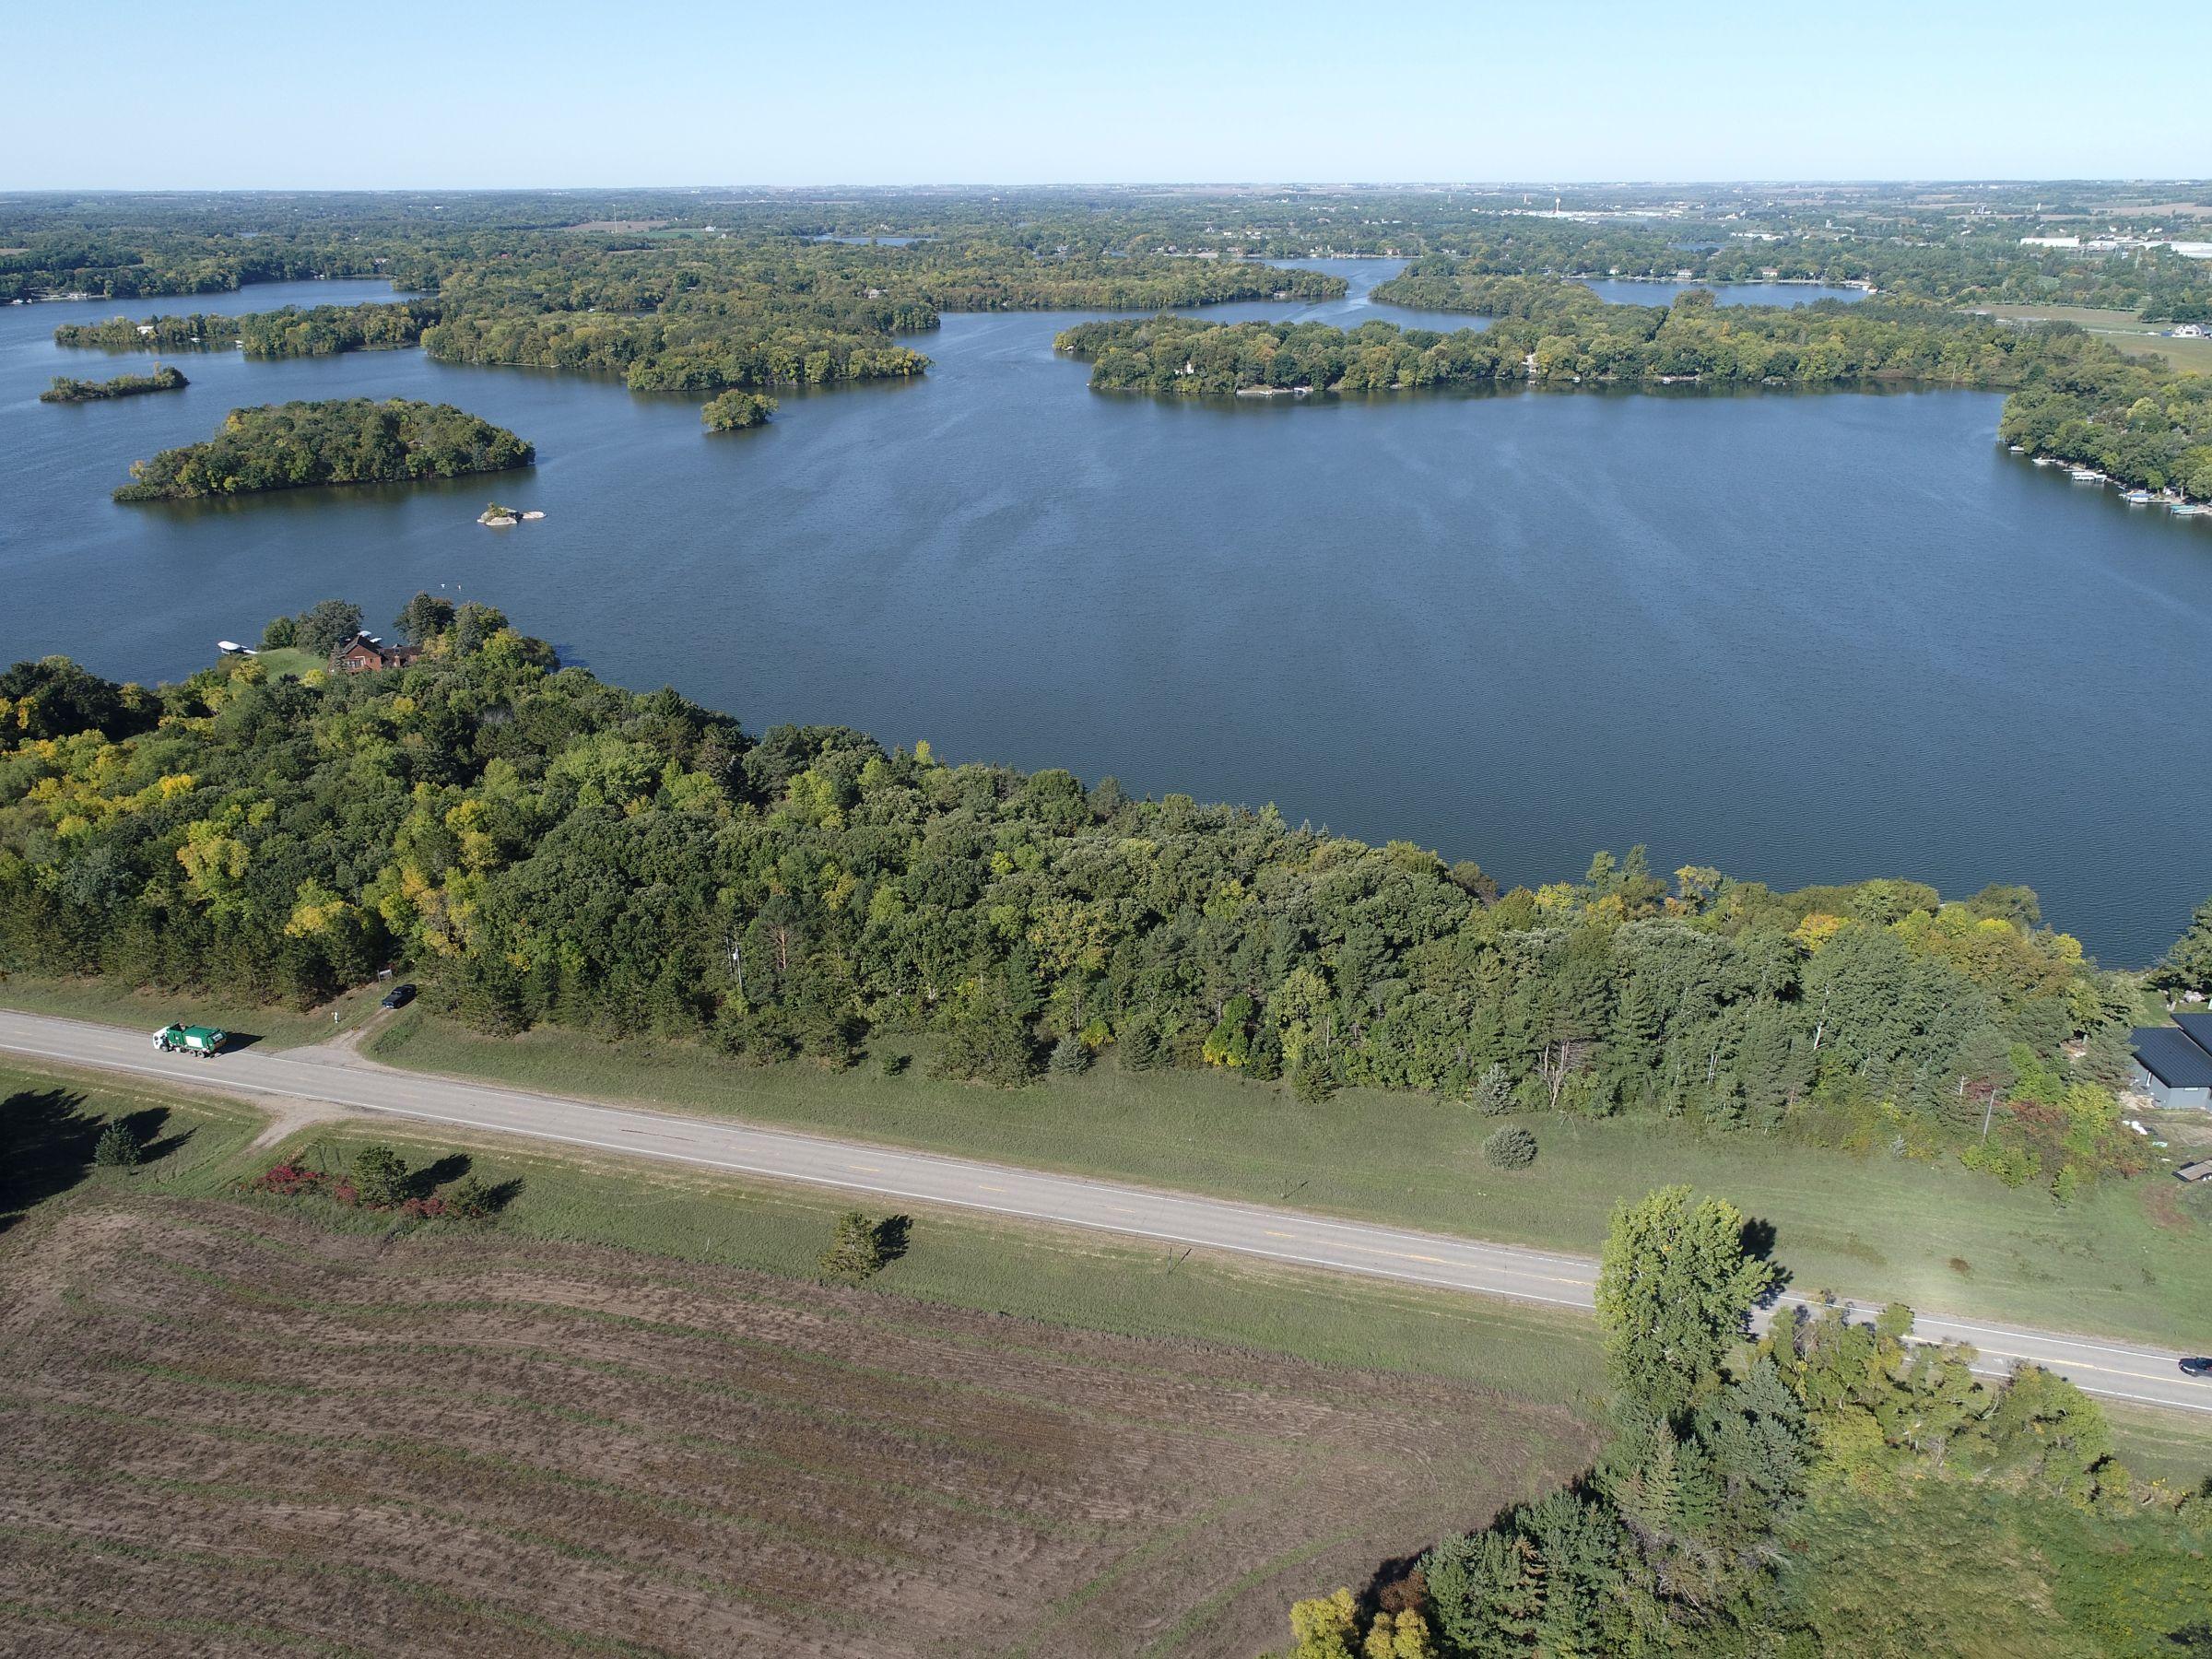 land-stearns-county-minnesota-298-acres-listing-number-15712-1-2021-09-23-131316.JPG